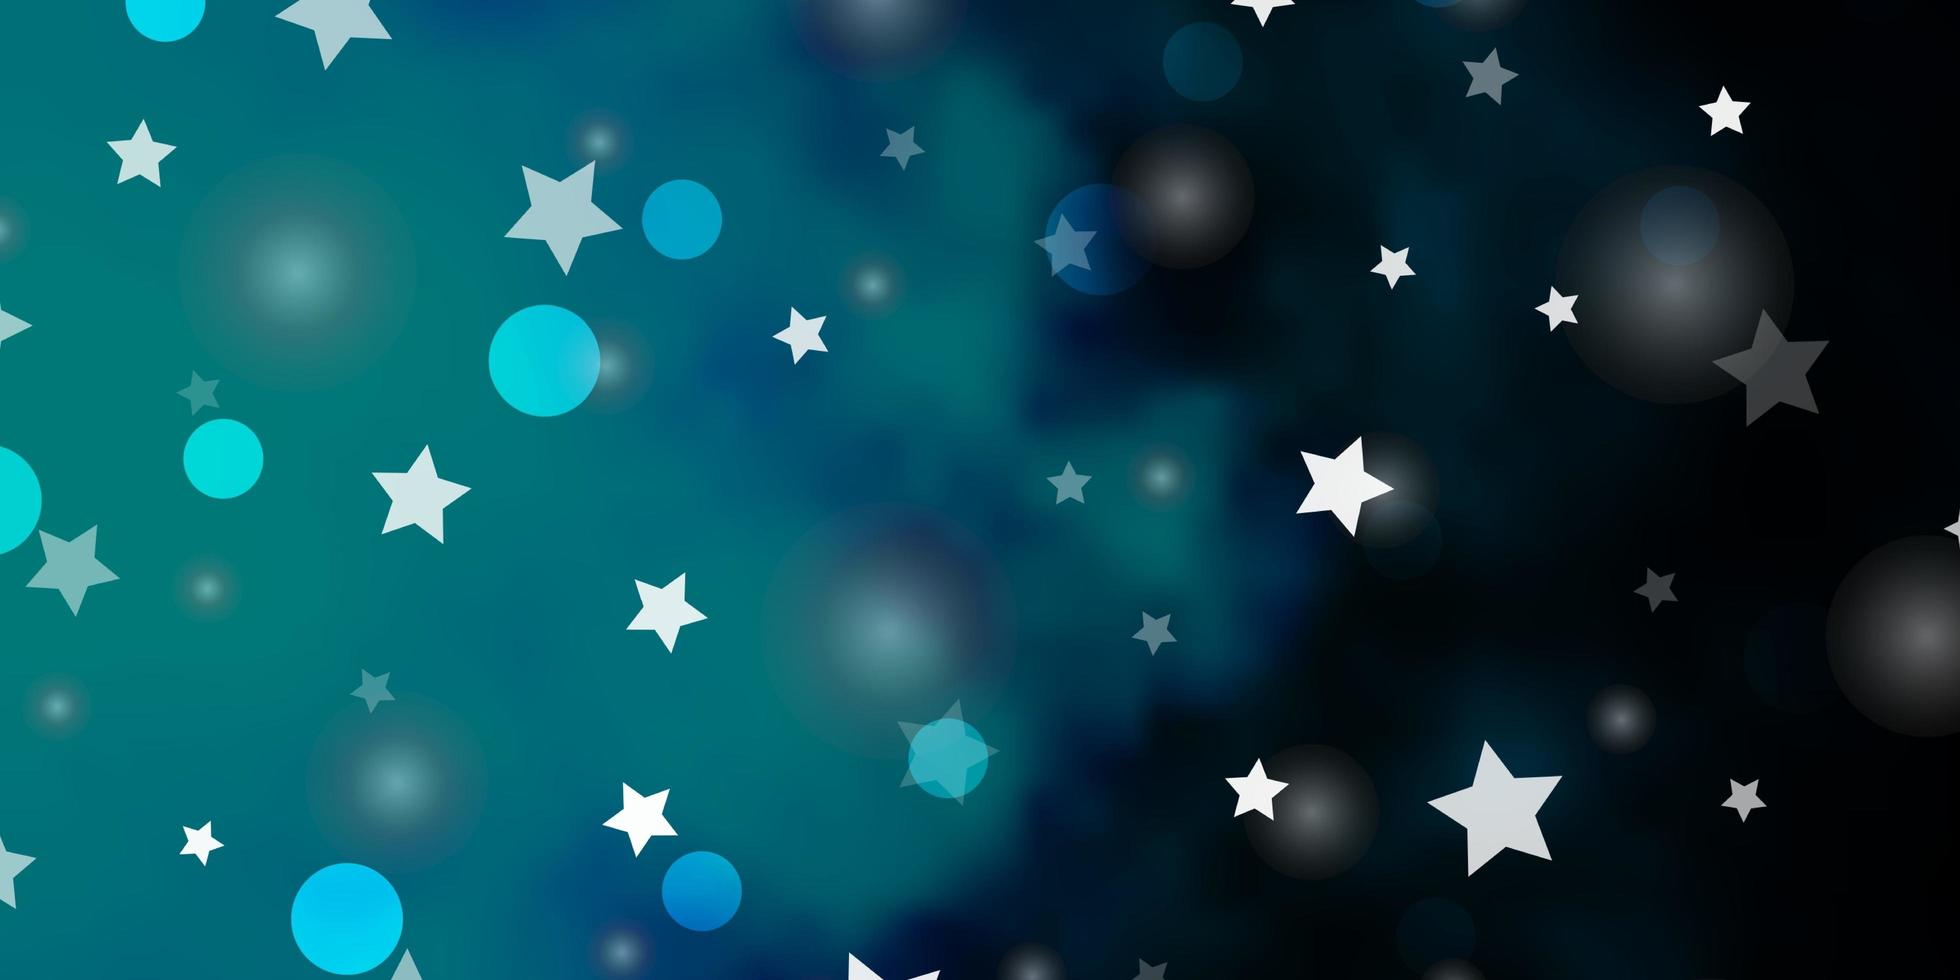 Telón de fondo de vector azul oscuro con círculos, estrellas.